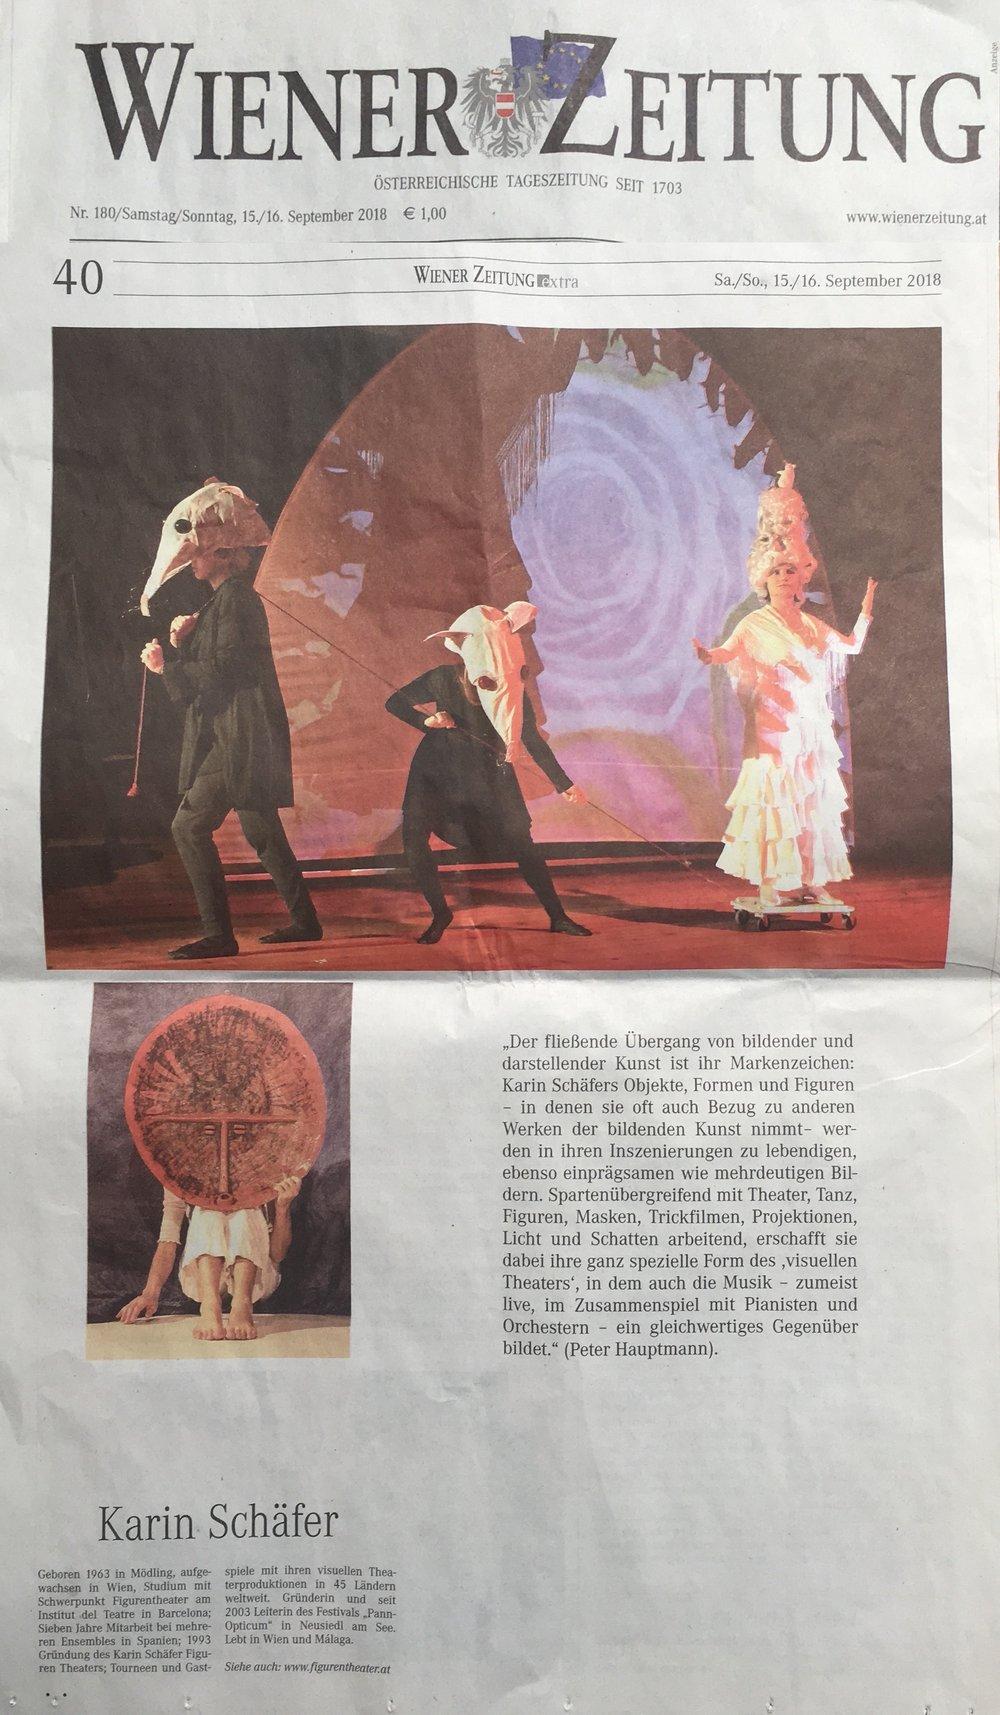 Karin Schäfer Figuren Theater Wiener Zeitung 15 09 2018.jpg